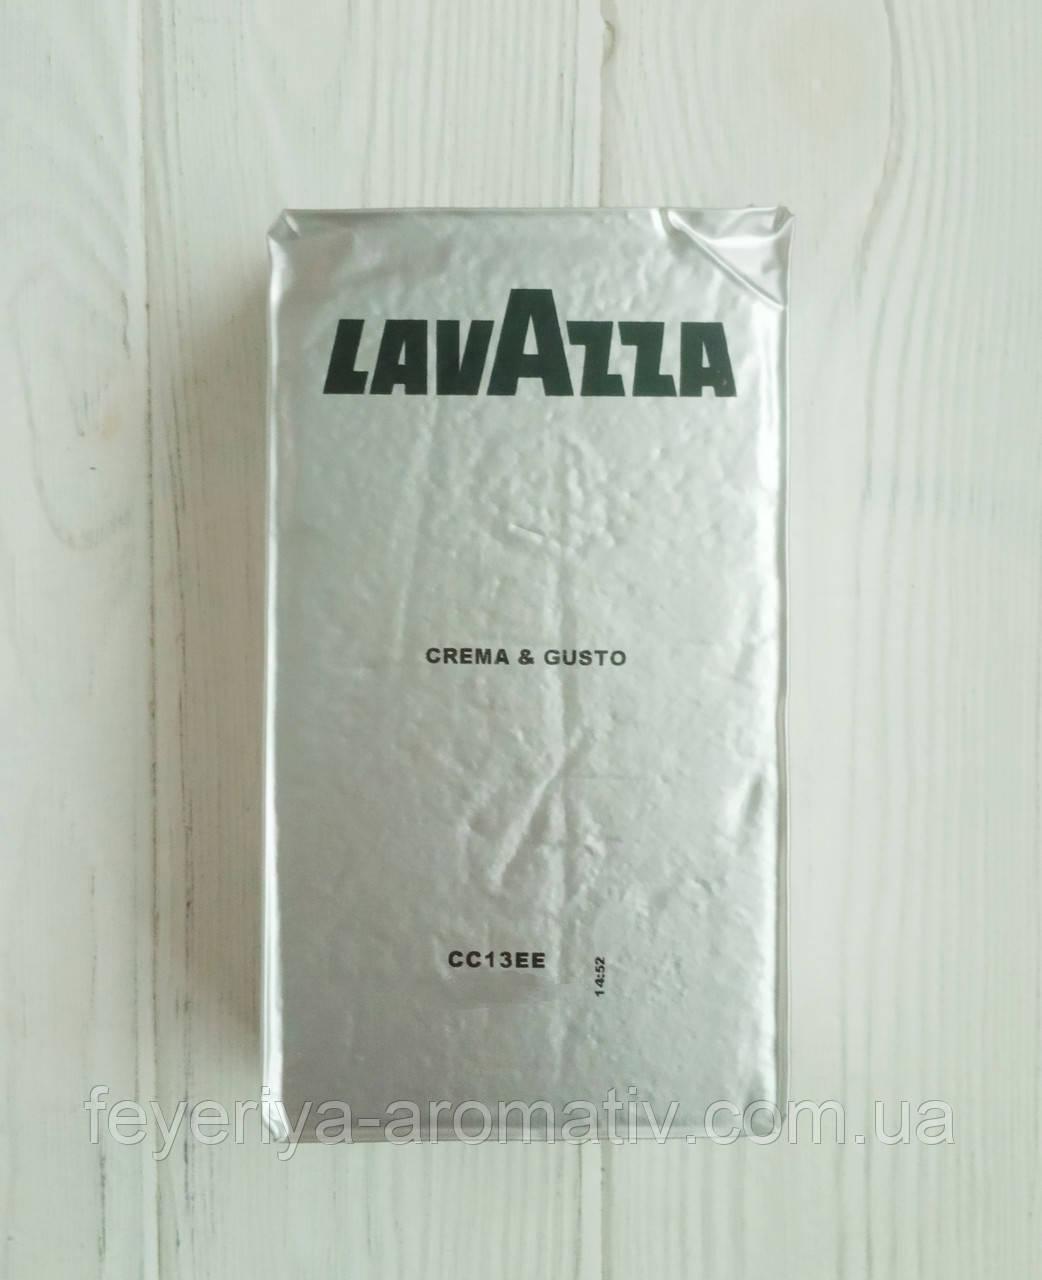 Кофе молотый Lavazza Crema e Gusto 250гр. (Италия)